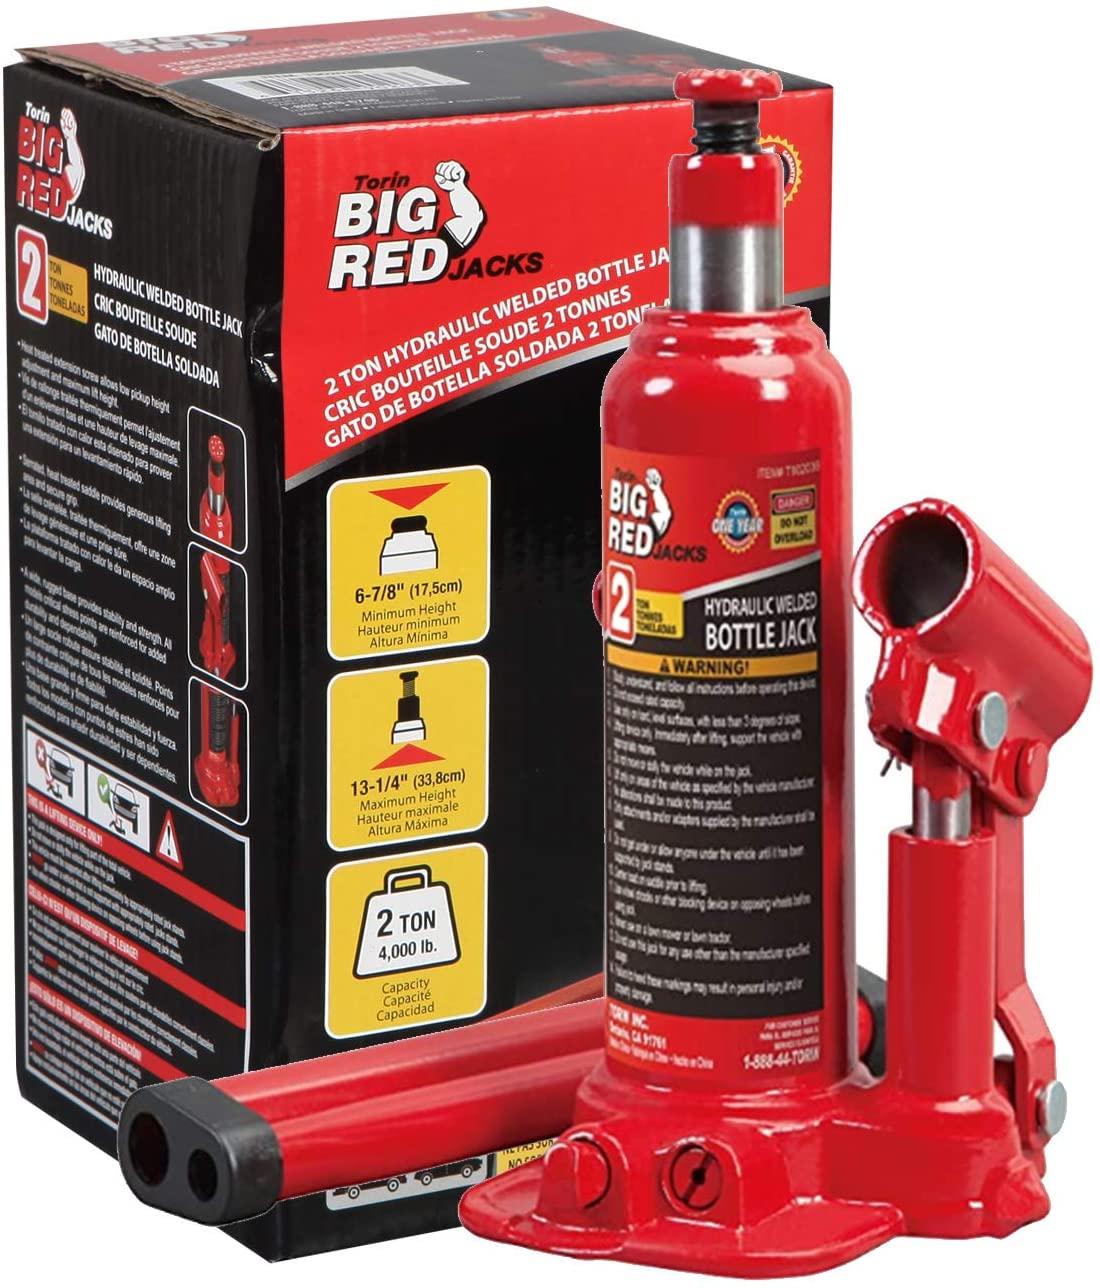 Amazon BIG RED T90203B Torin Hydraulic Welded Bottle Jack, 2 Ton (4,000 lb) Capacity $13.54